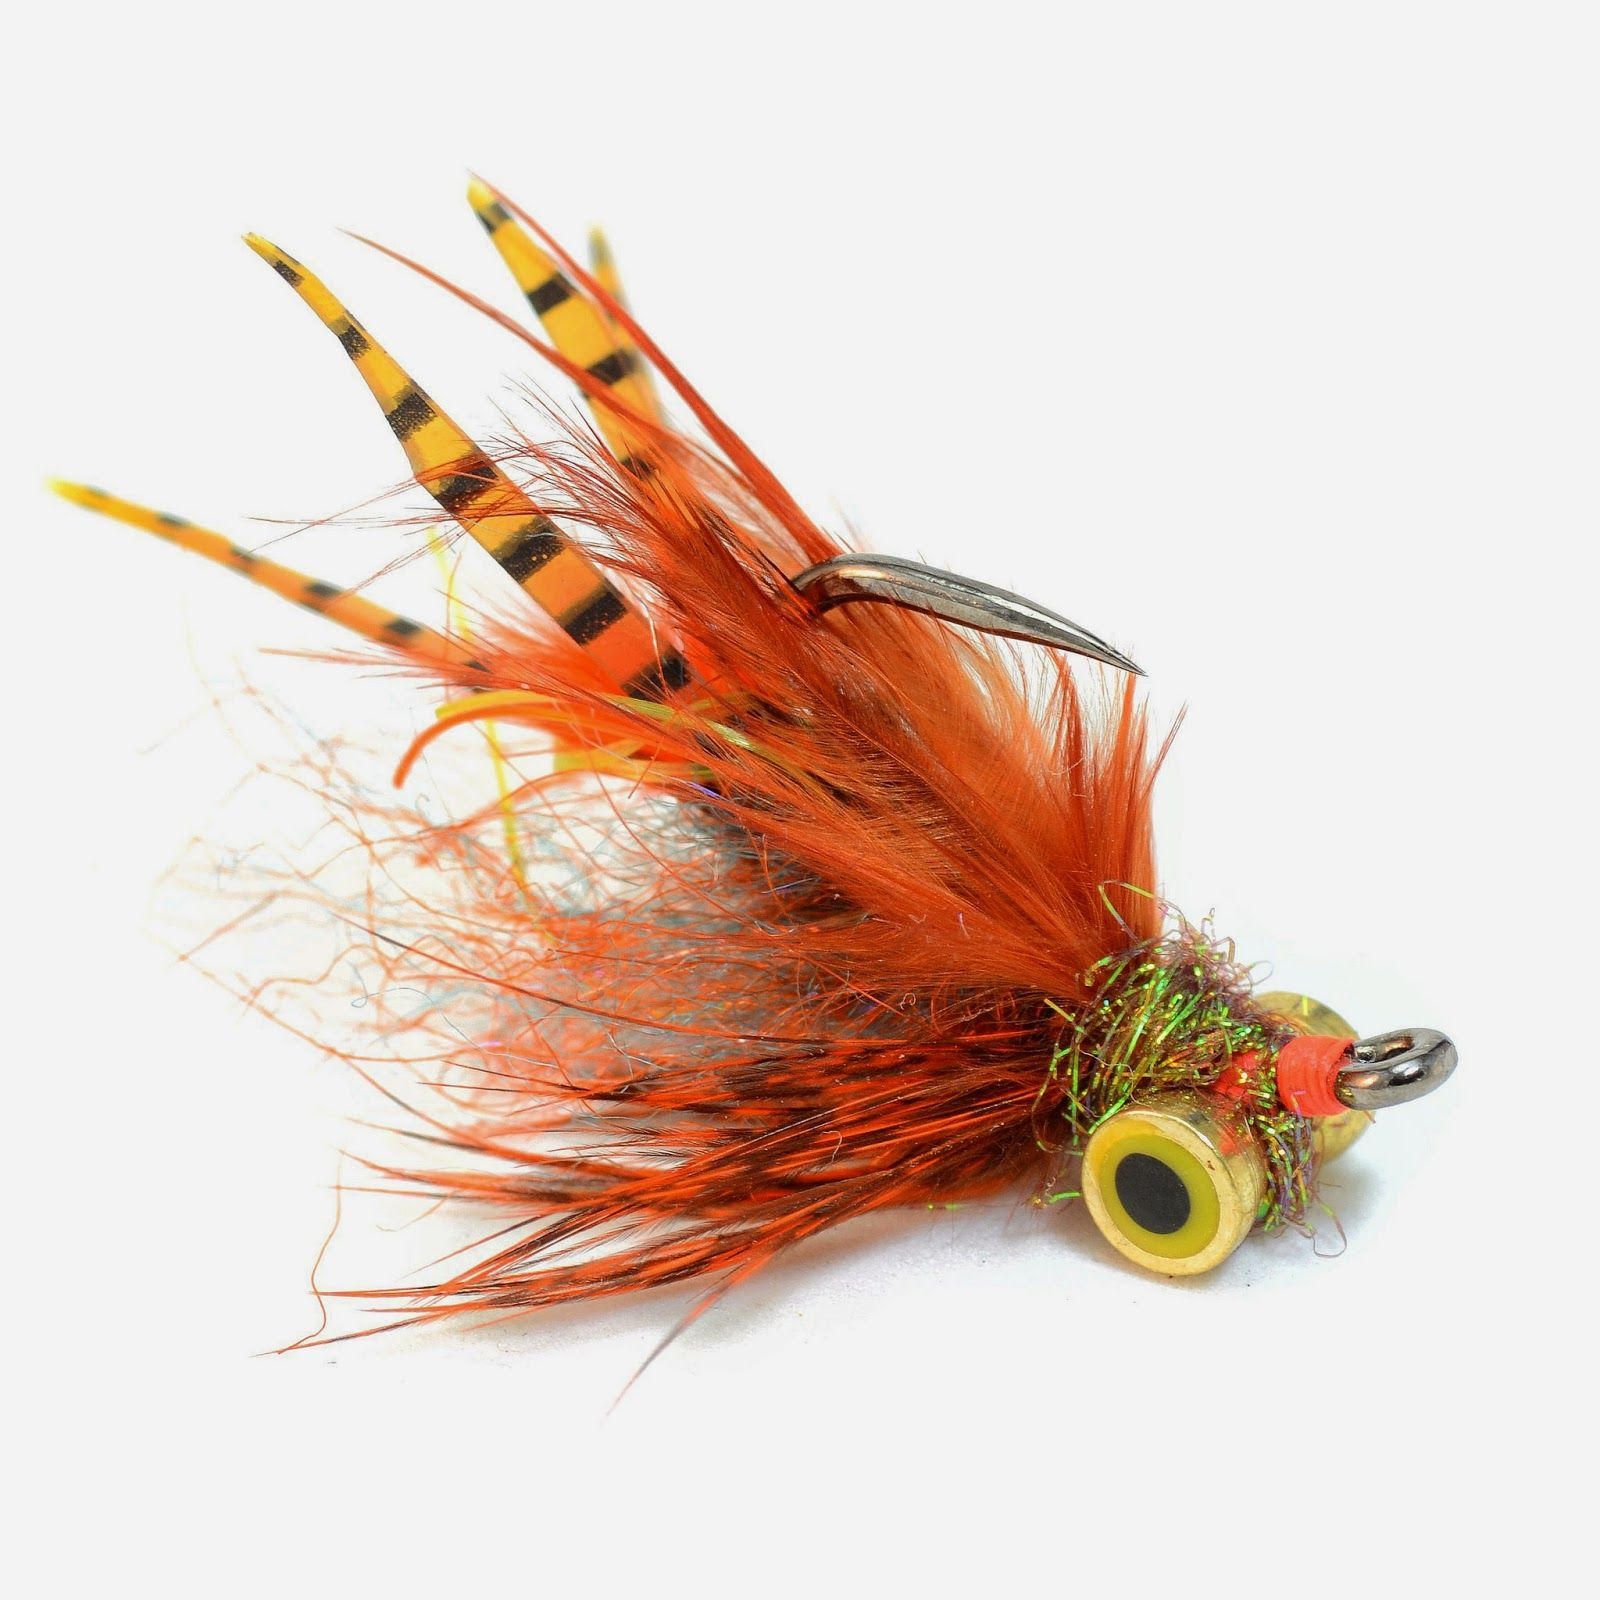 fly fishing stonfocom - HD1600×1600